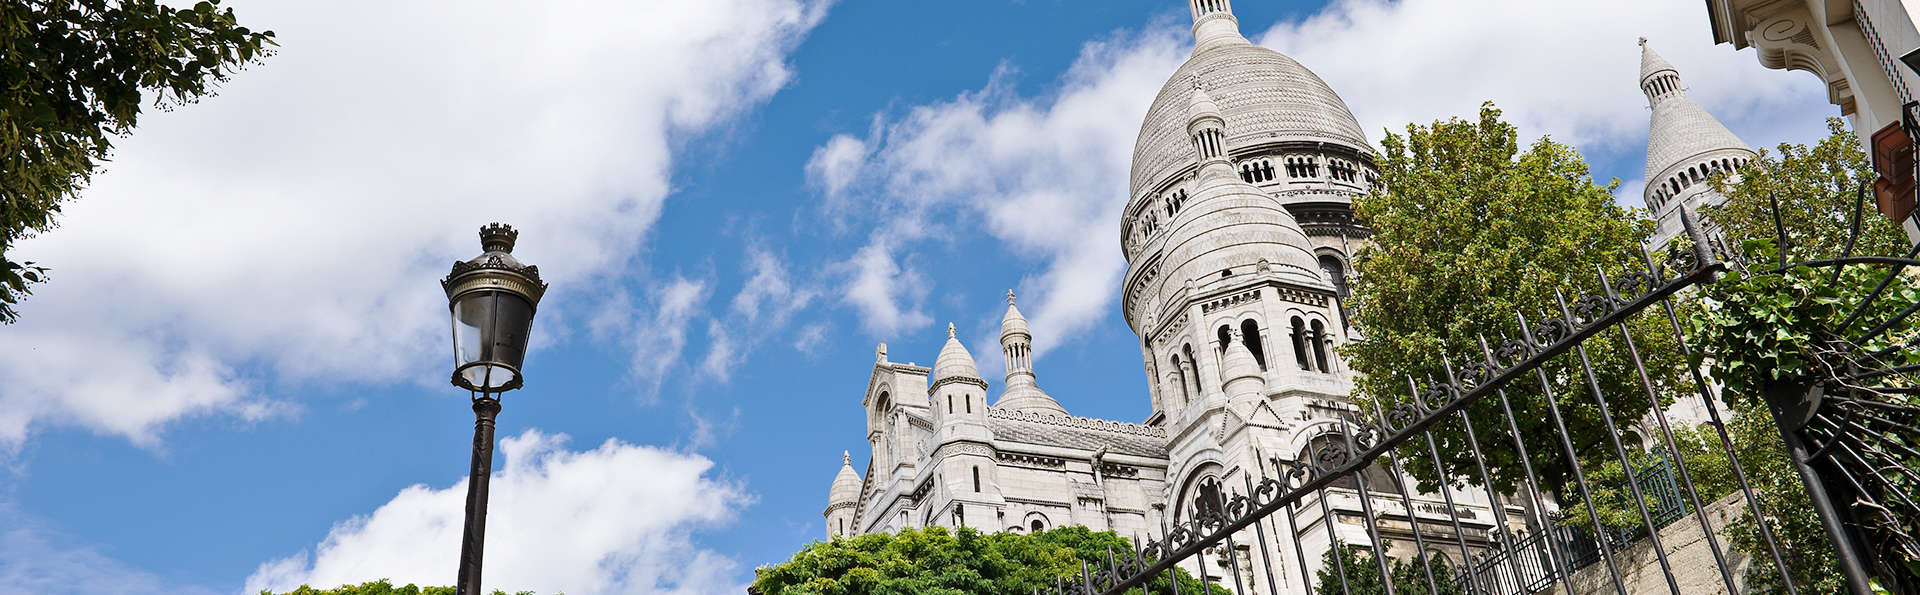 Hôtel Les Jardins de Montmartre - EDIT_Facade_2.jpg